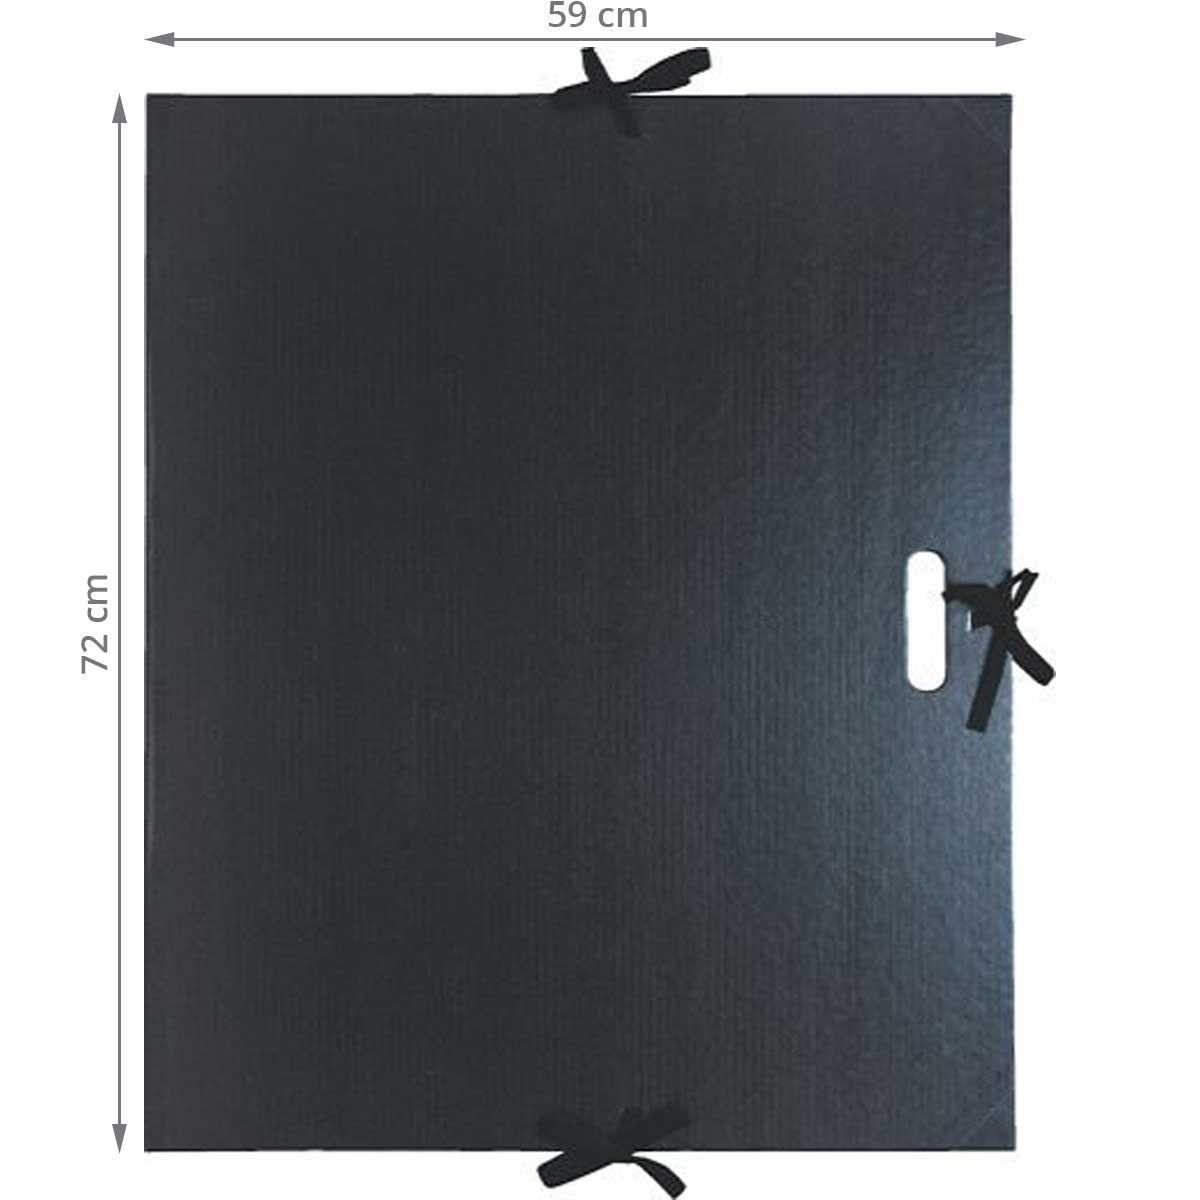 carton dessin avec poign e format raisin. Black Bedroom Furniture Sets. Home Design Ideas